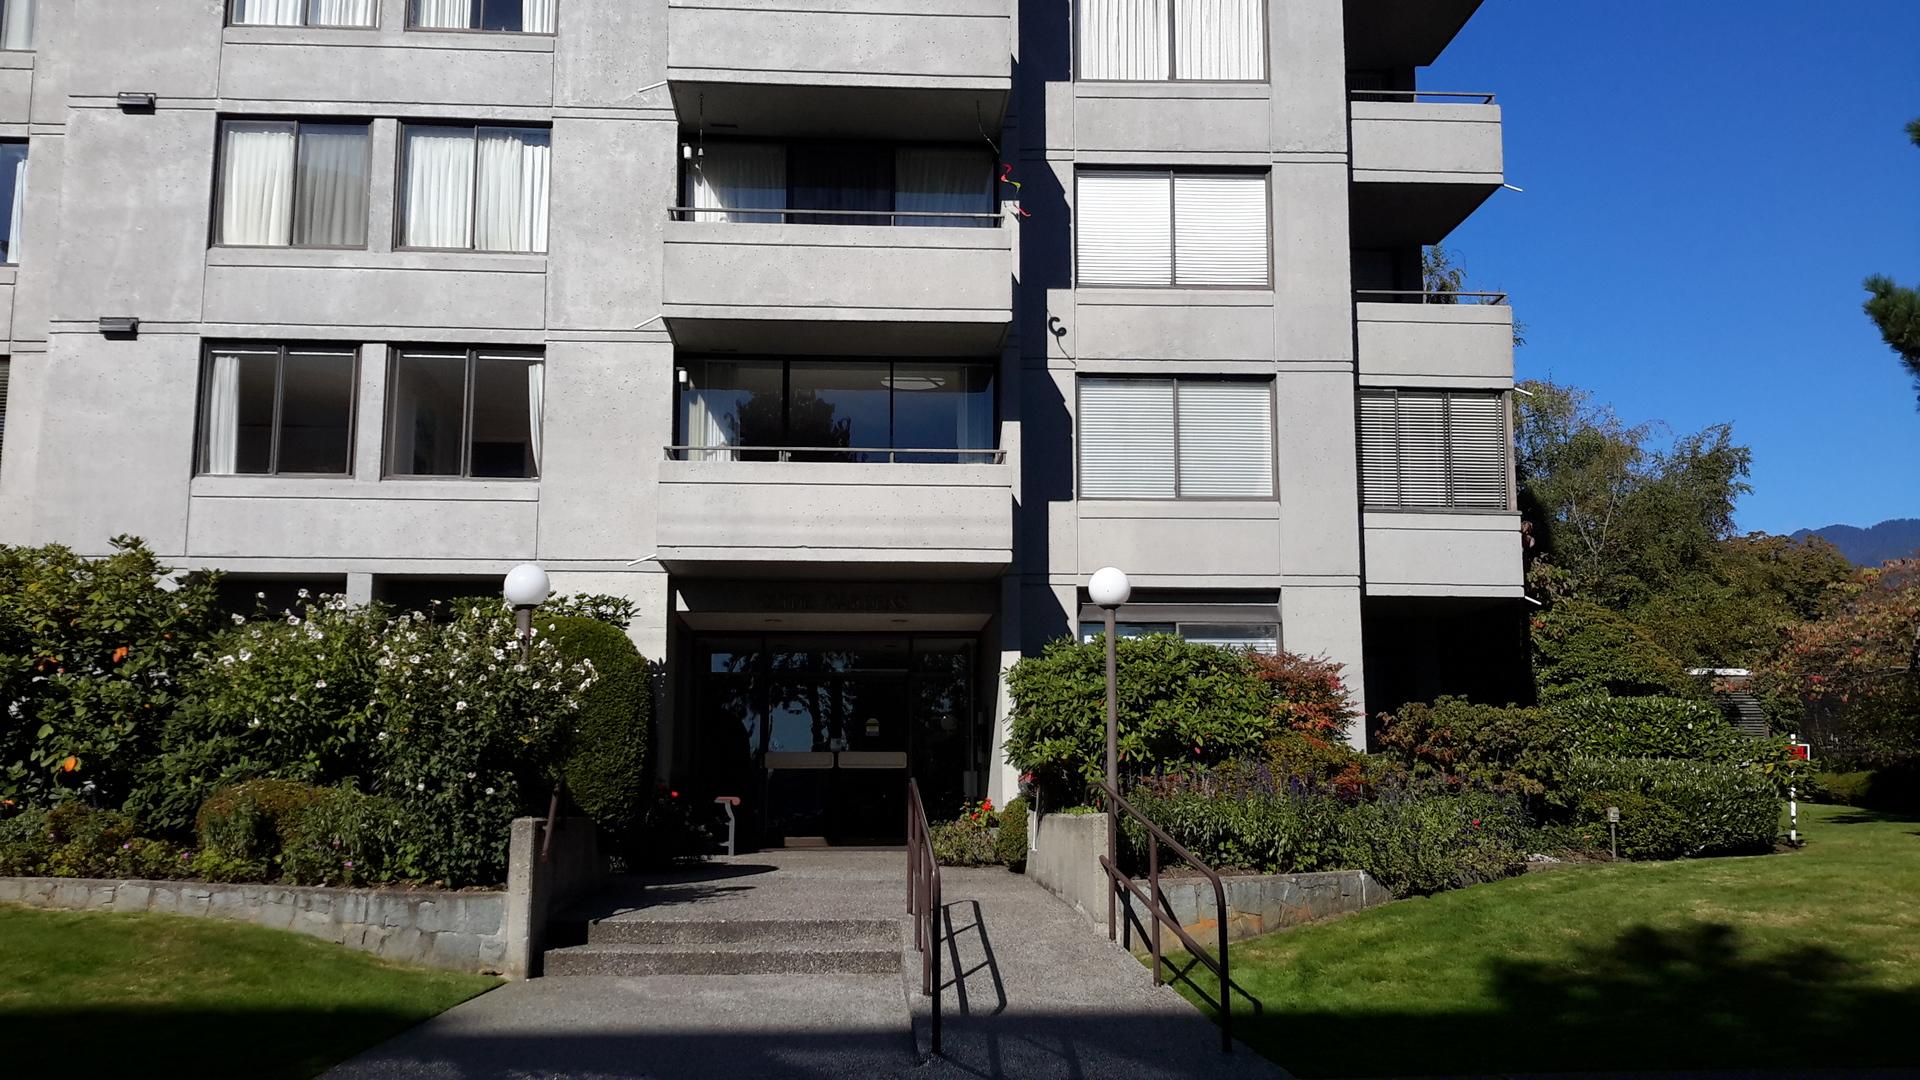 20181004_143233 at 303 - 1341 Clyde Avenue, Ambleside, West Vancouver